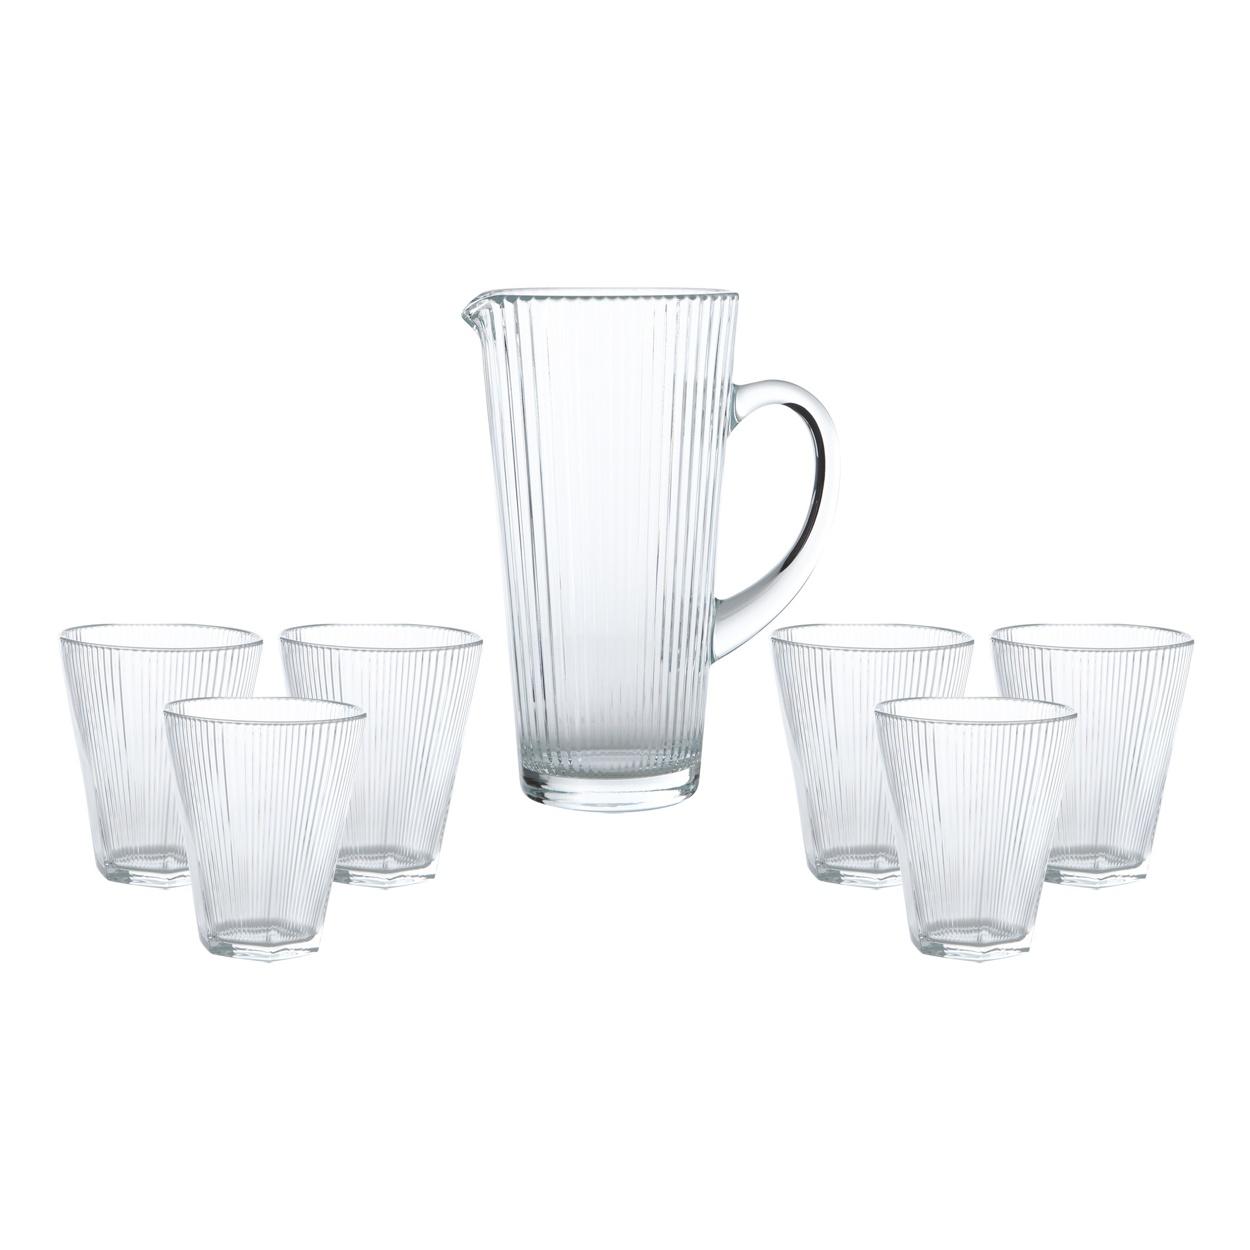 Онлайн каталог PROMENU: Набор: графин 1,2 л со стаканами 0,34 л Vidivi, 7 предметов                                   66173M